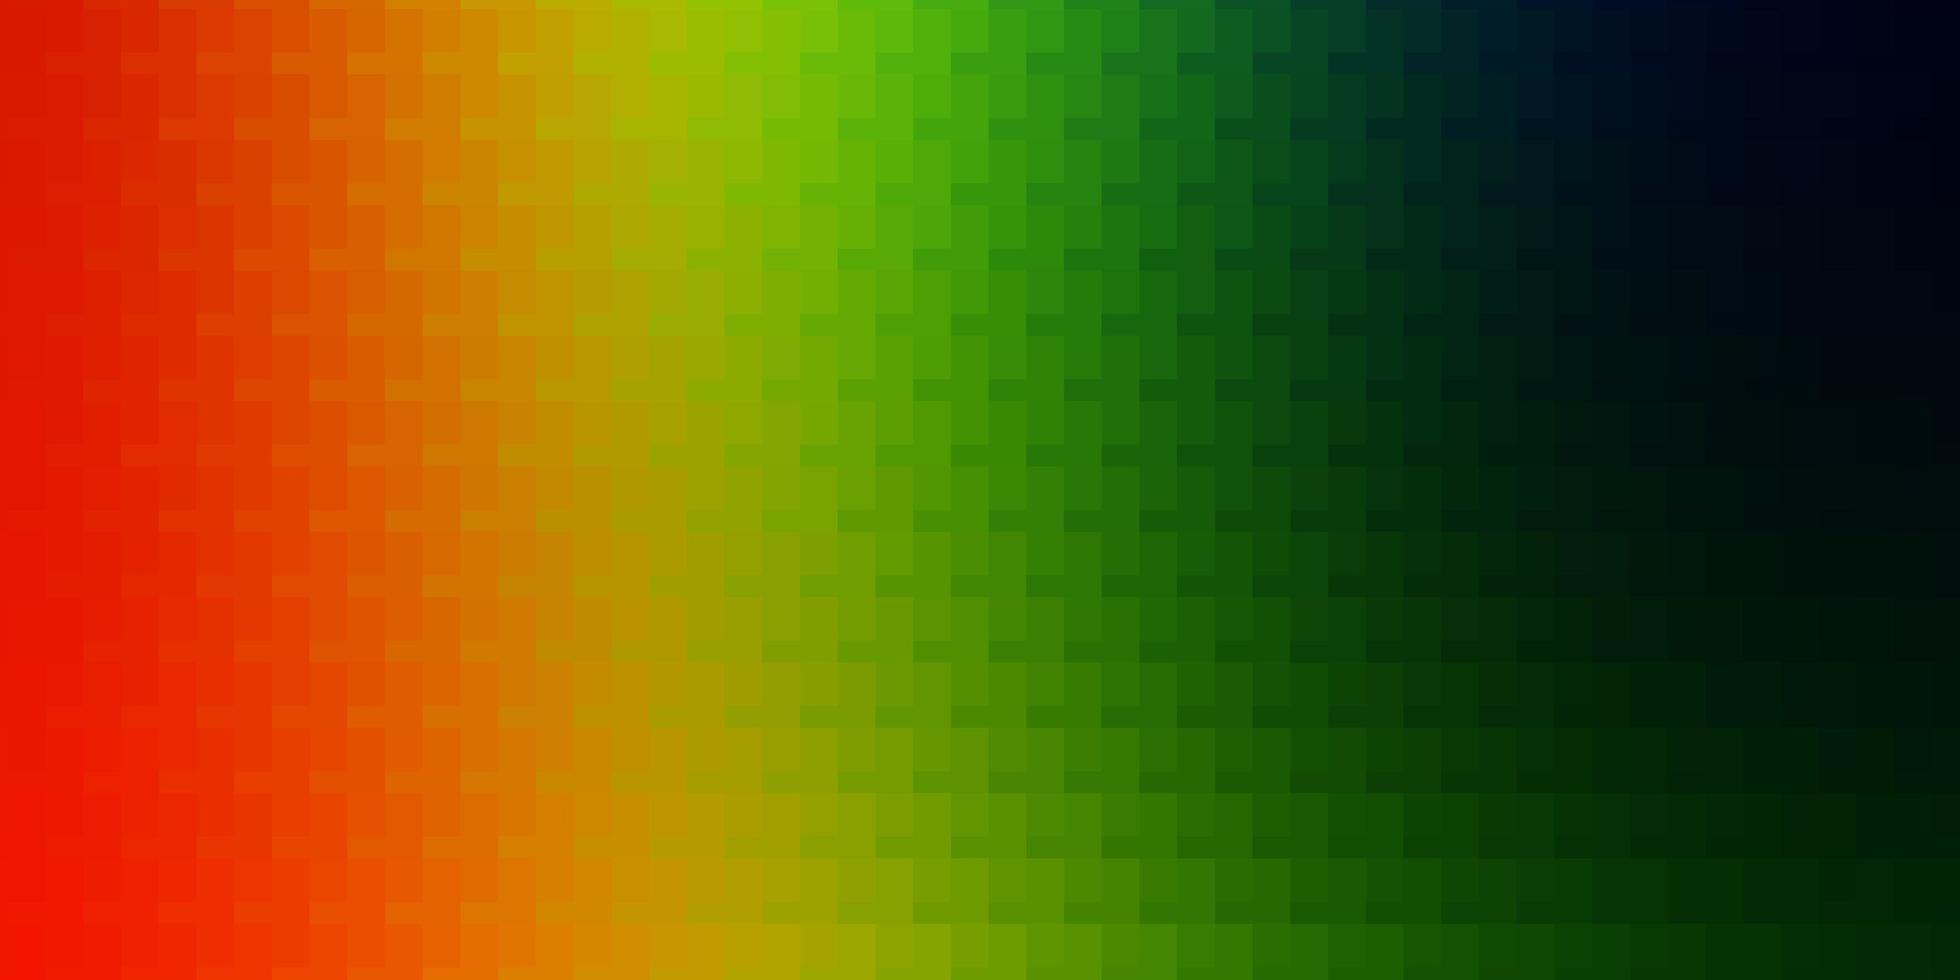 ljus flerfärgad vektor mönster i fyrkantig stil.